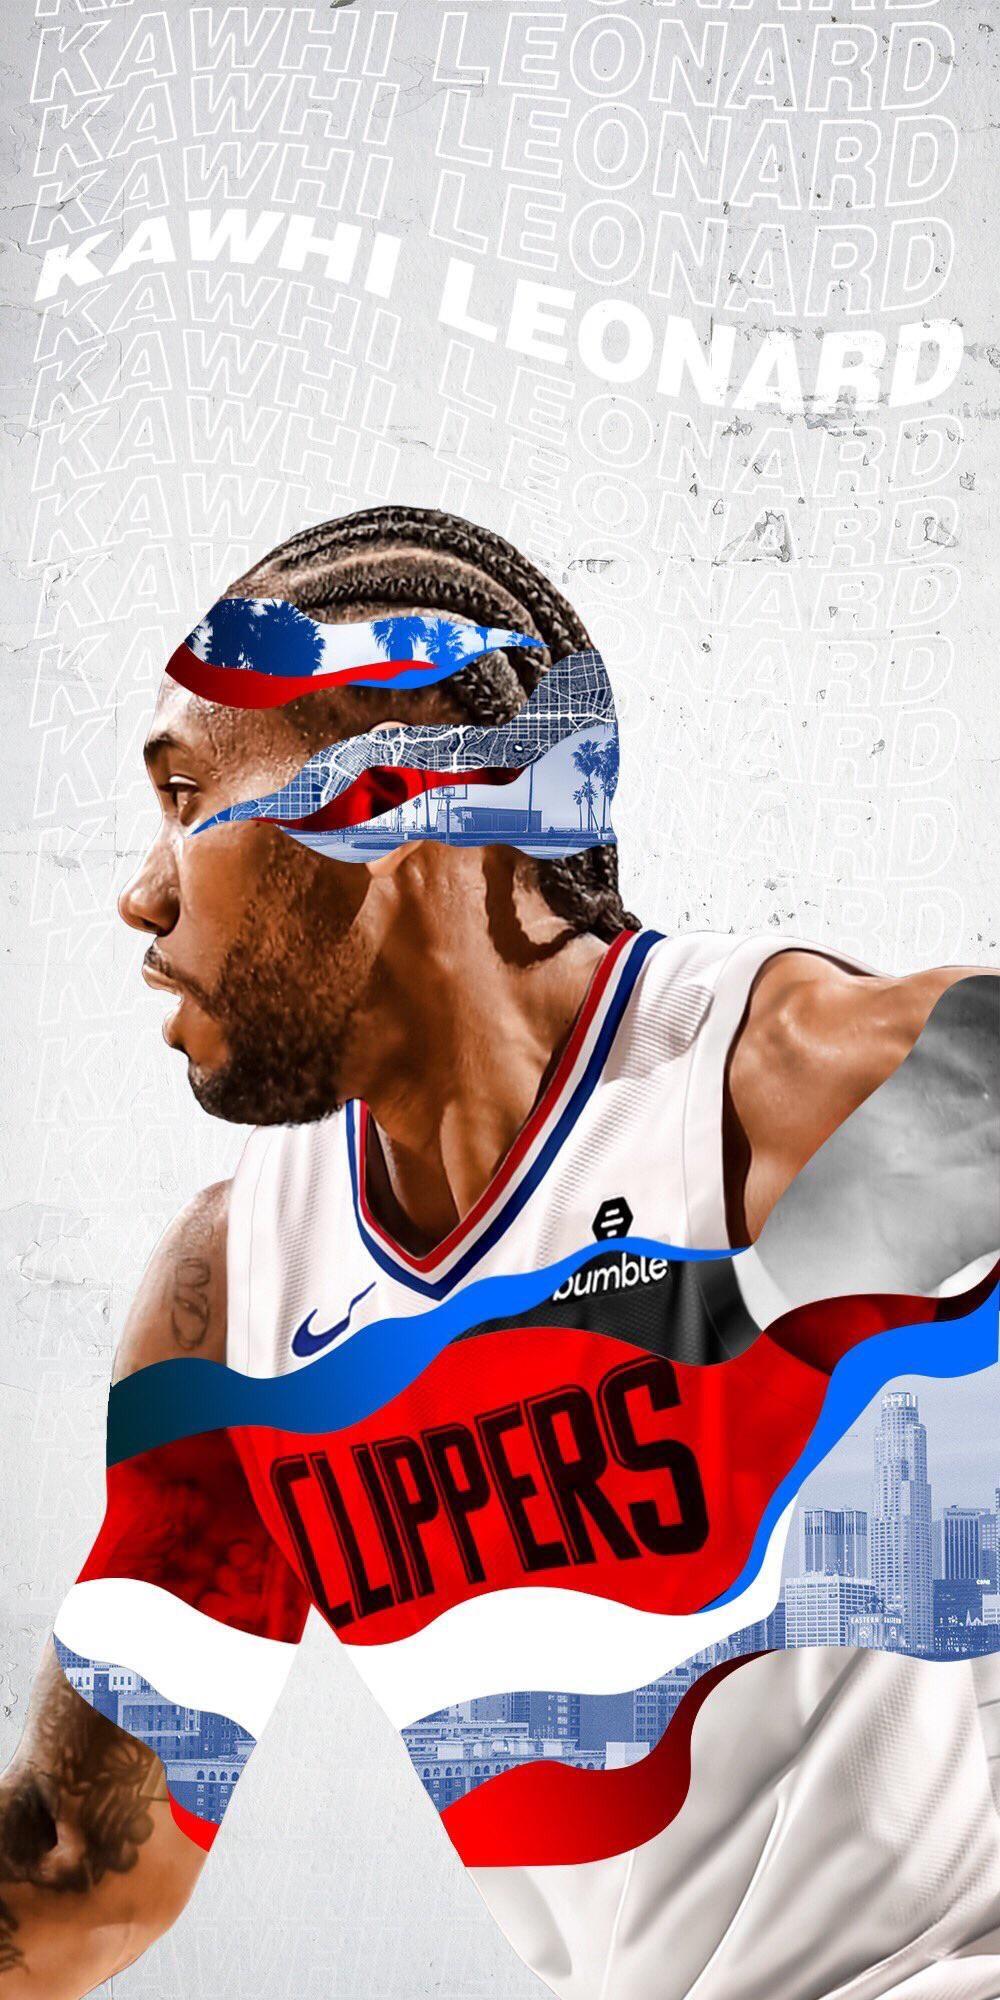 Kawhi Leonard La Clippers Wallpaper Iphone Nba Basketball Art Basketball Players Nba Nba Pictures